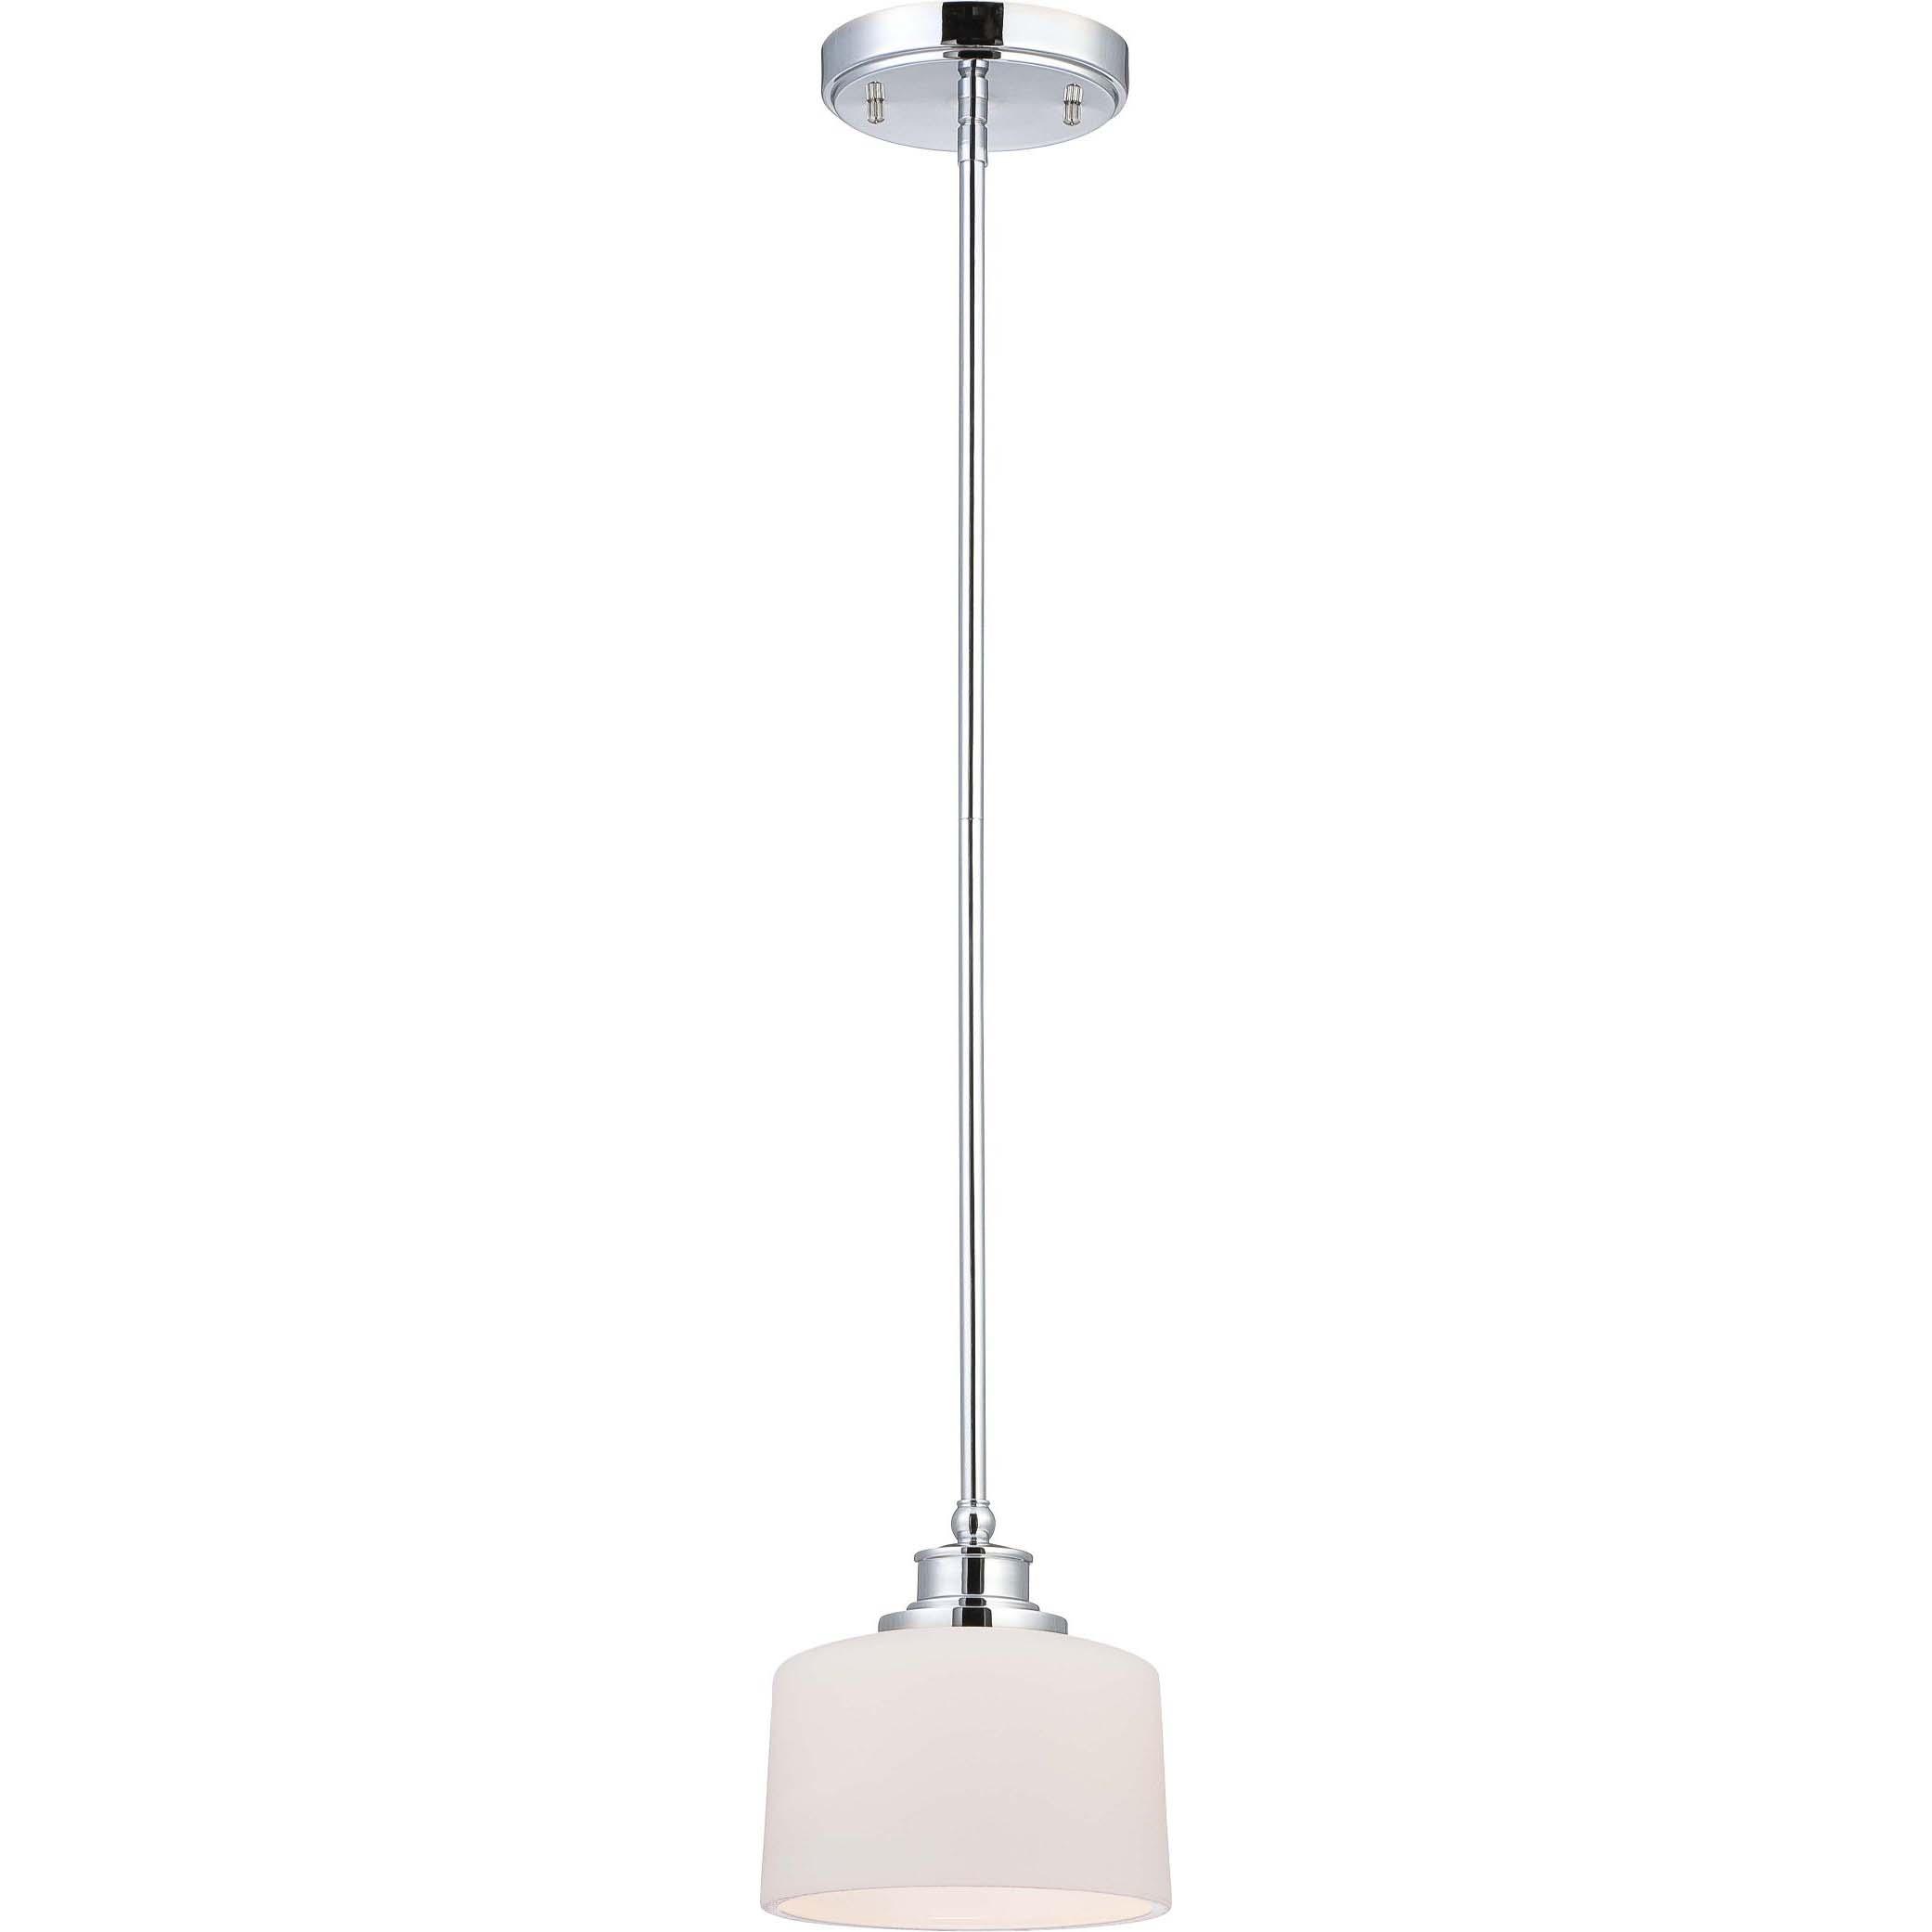 Soho 1 Light Polished Chrome With Satin White Glass Mini Pendant